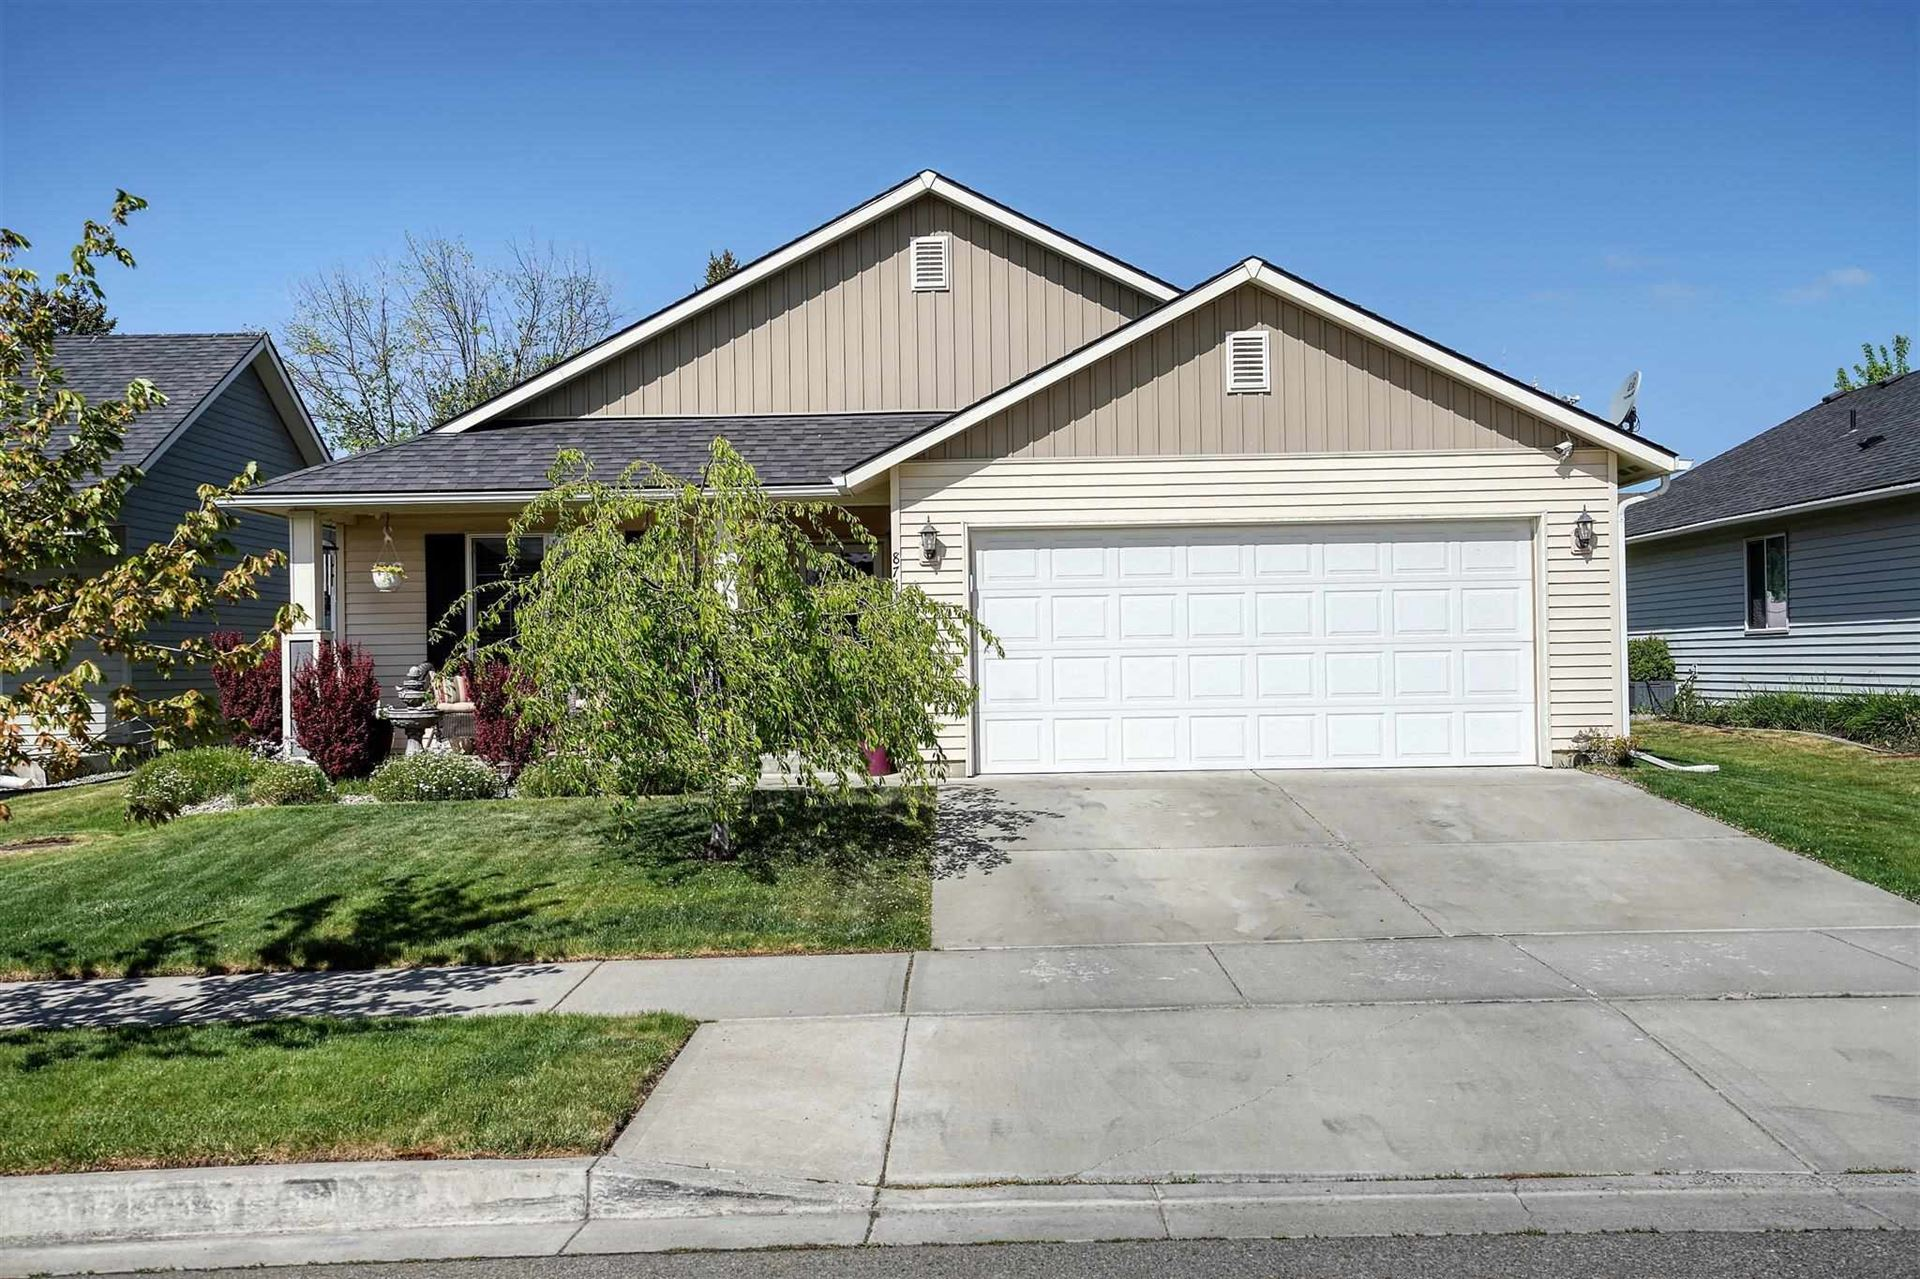 8711 N Elm St, Spokane, WA 99208 - #: 202115884